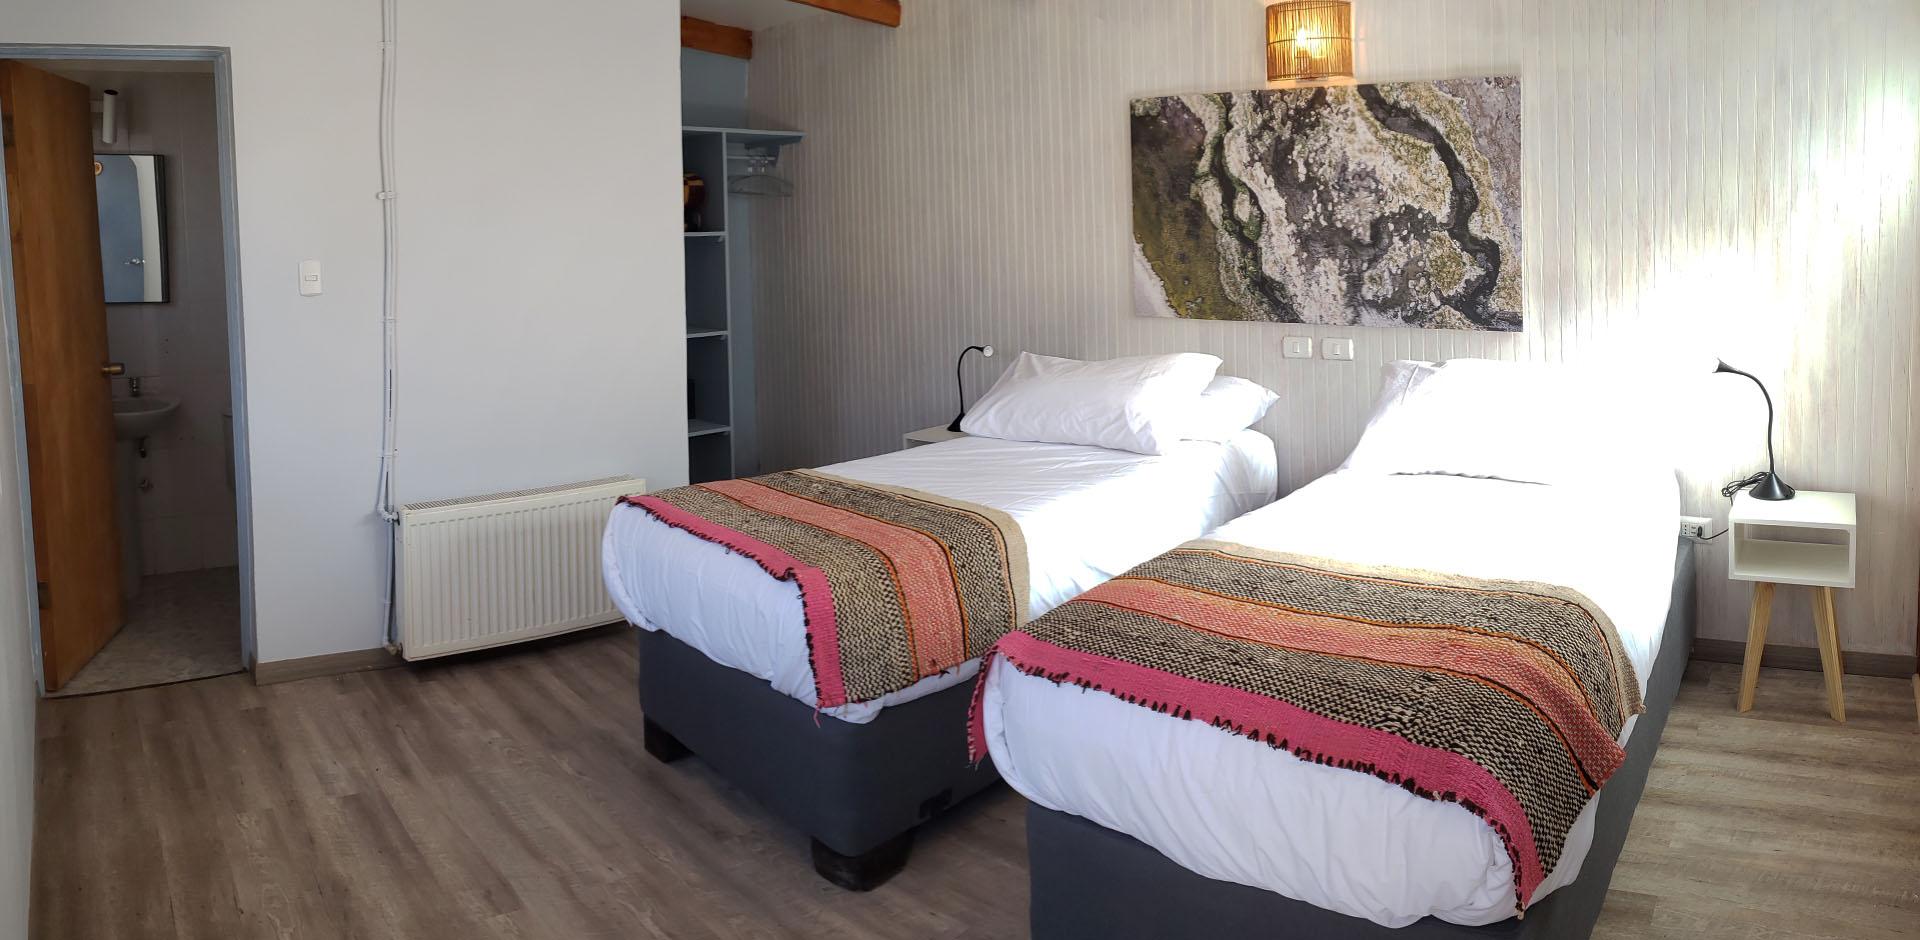 Hotel Jardín Atacama | San Pedro de Atacama | Chile slide_9 Home